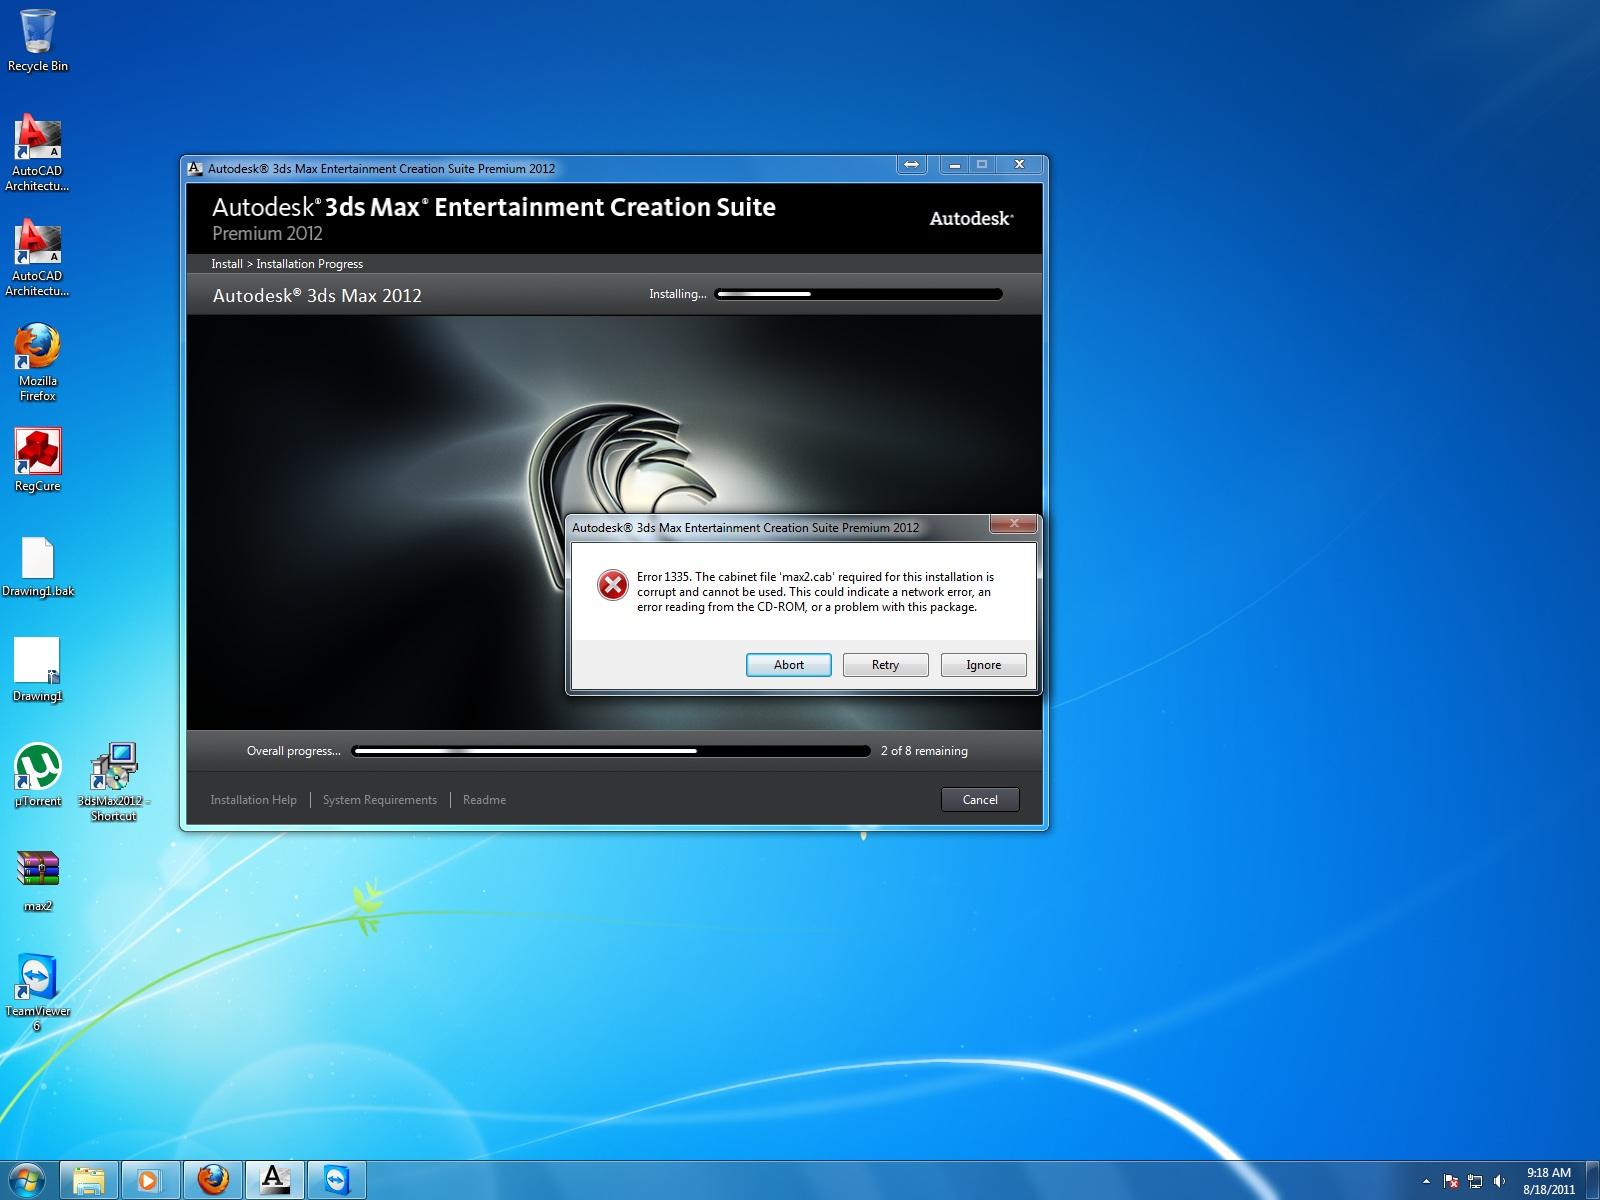 error 1335. the cabinet file 'max2.cab' required - Autodesk Community